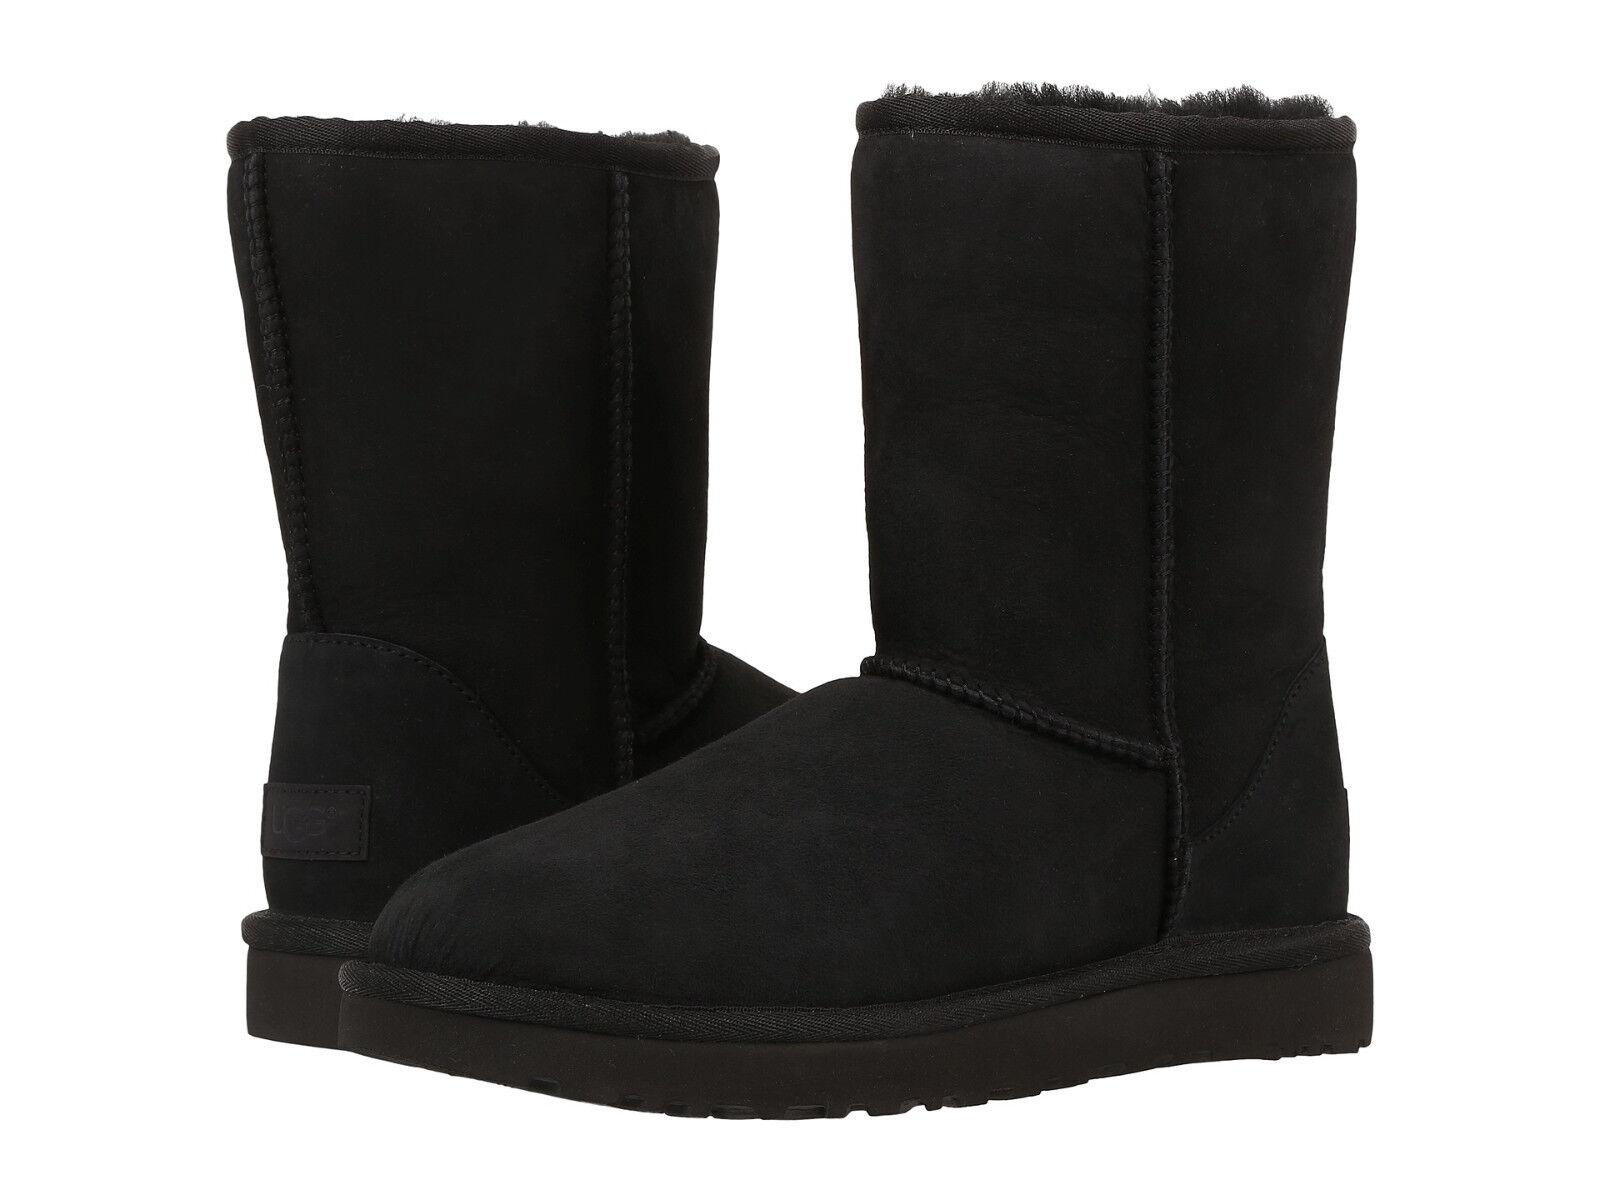 $127.92 - Women UGG Australia Classic Short II Boot 1016223 Black Twinface 100% Authentic